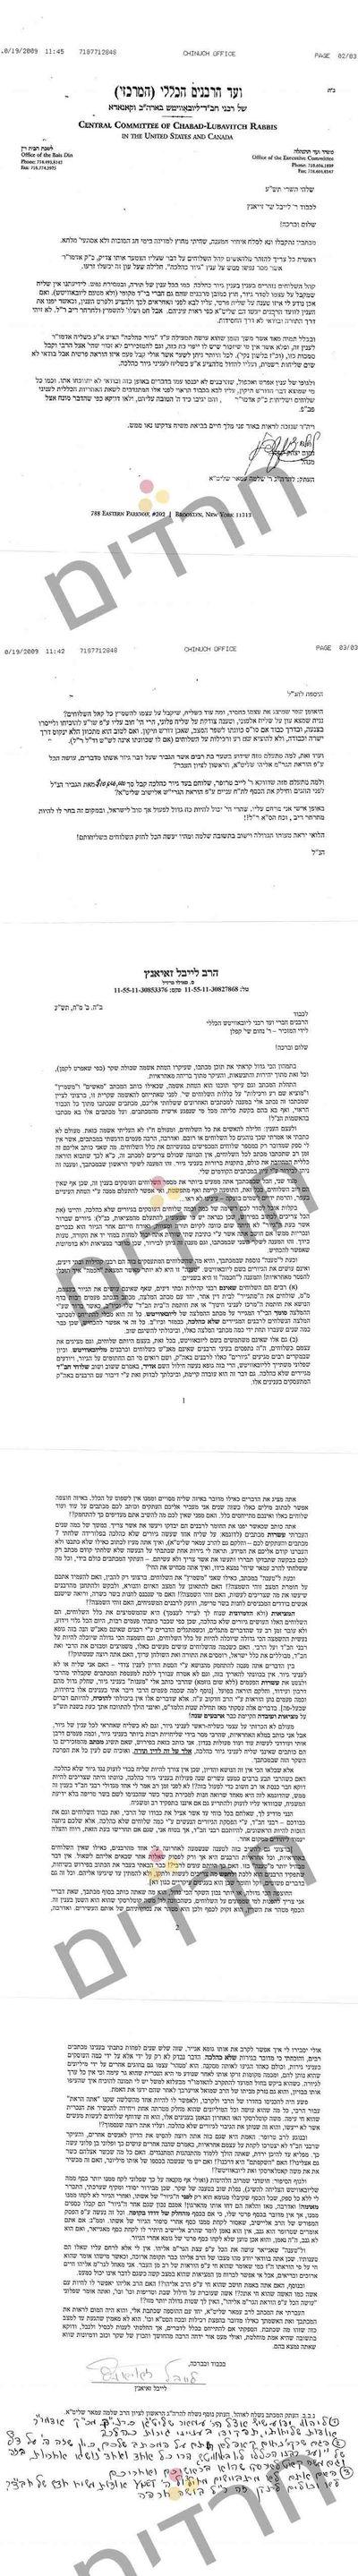 Chabad Conversion Doc 1